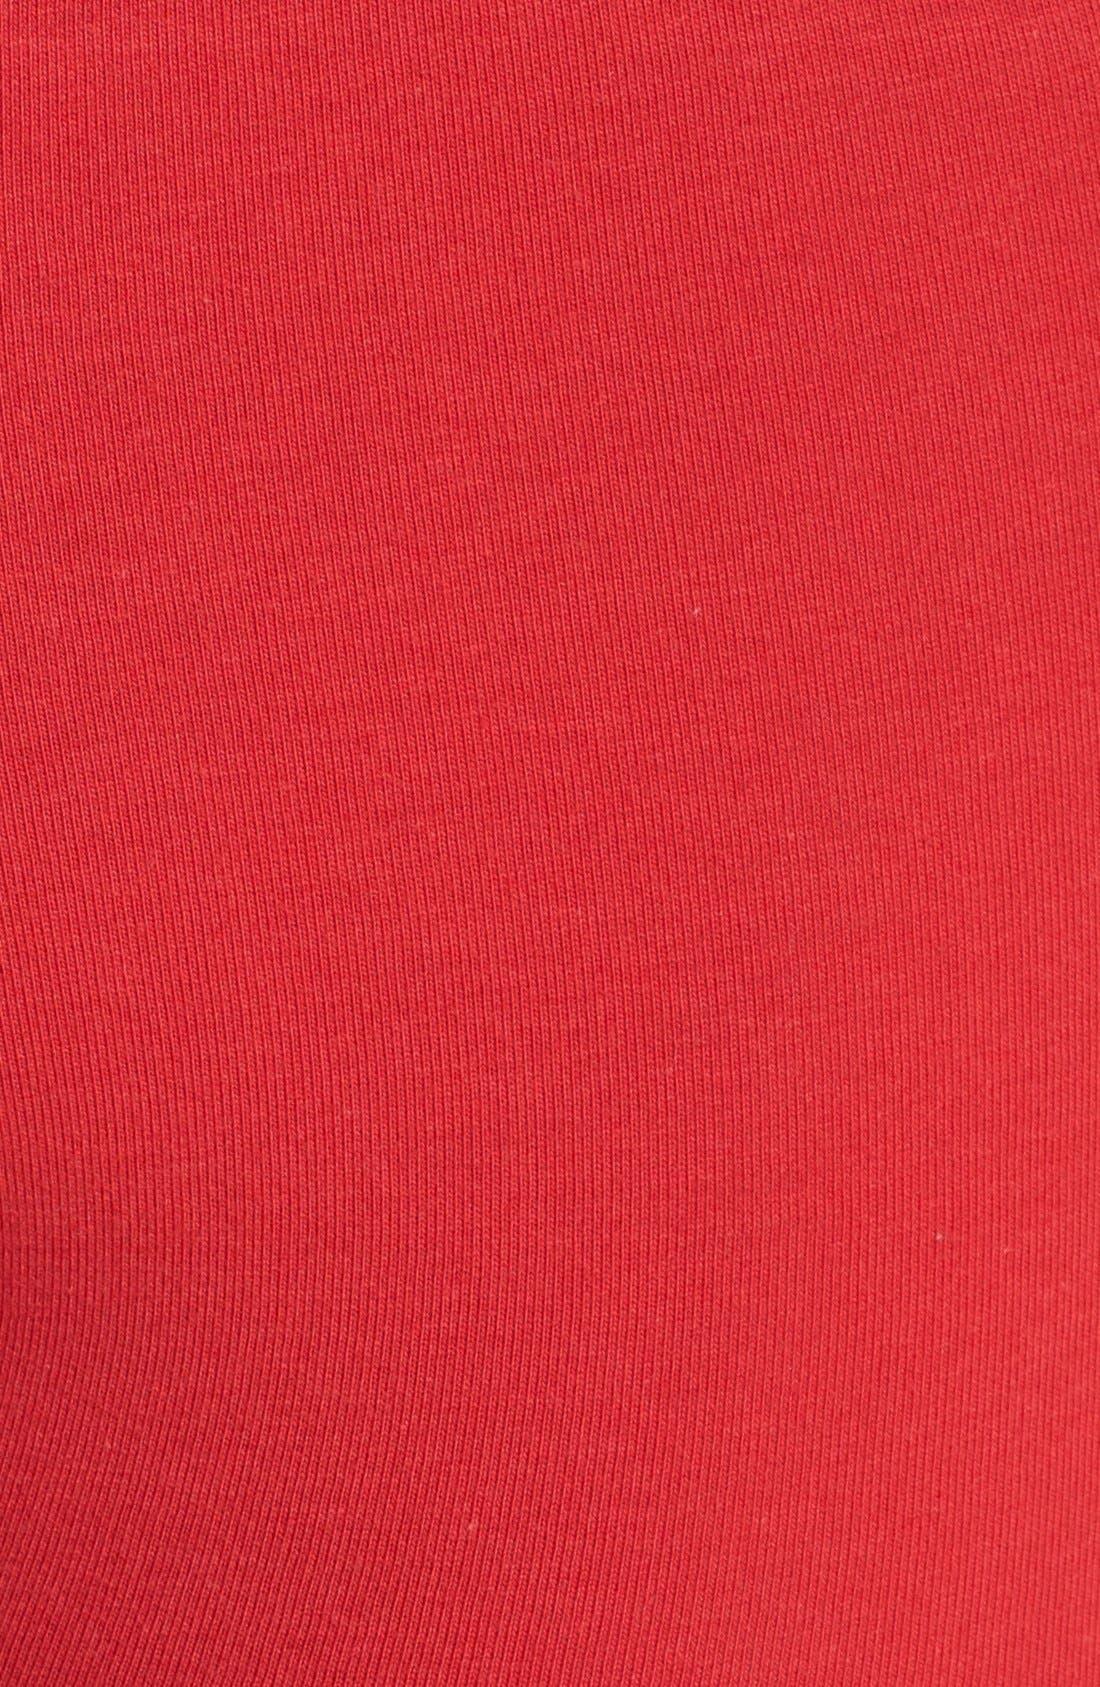 Alternate Image 3  - Emporio Armani Stretch Cotton Trunks (2-Pack)